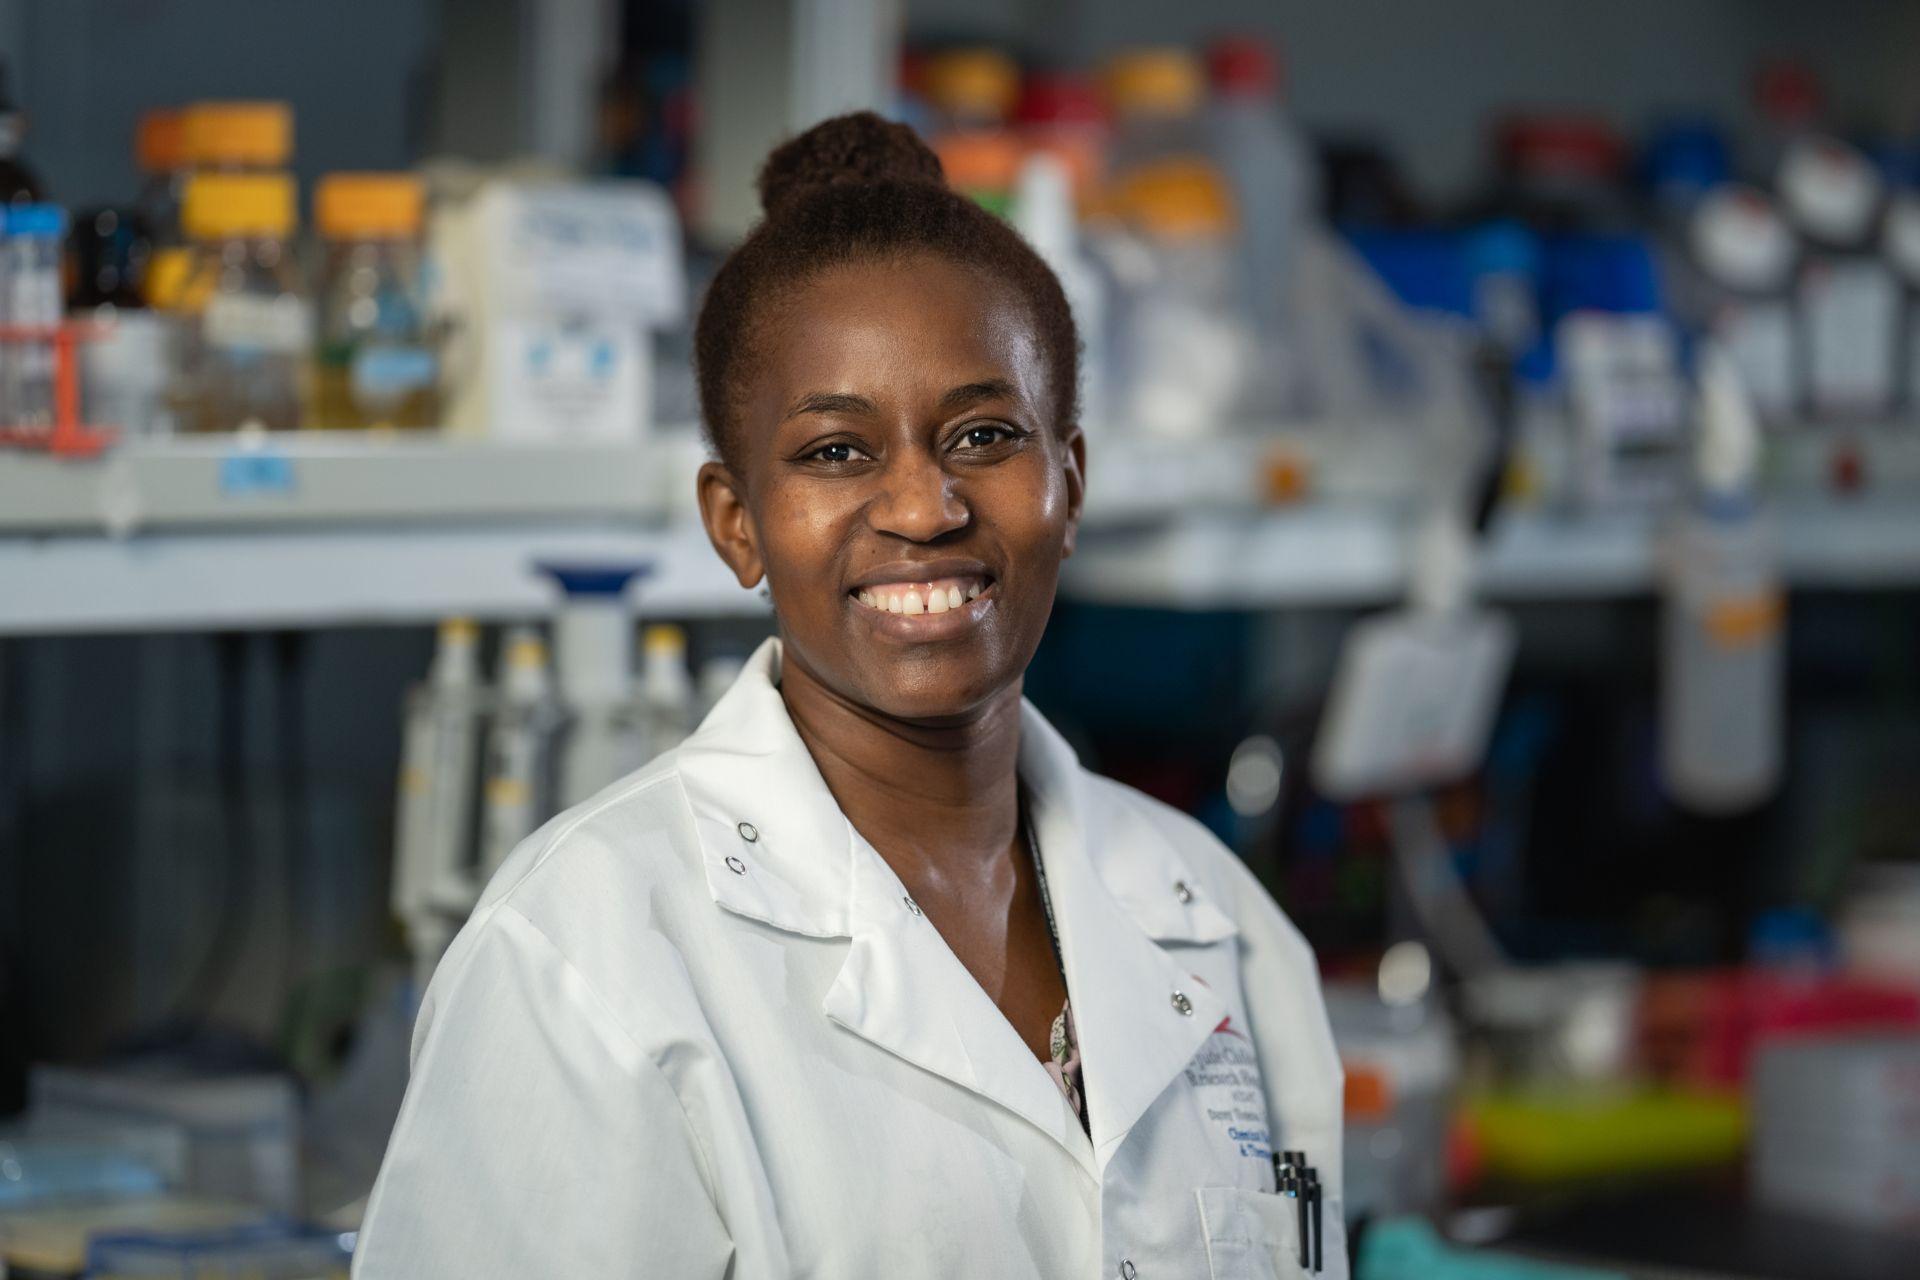 Monicah Bwayi, PhD